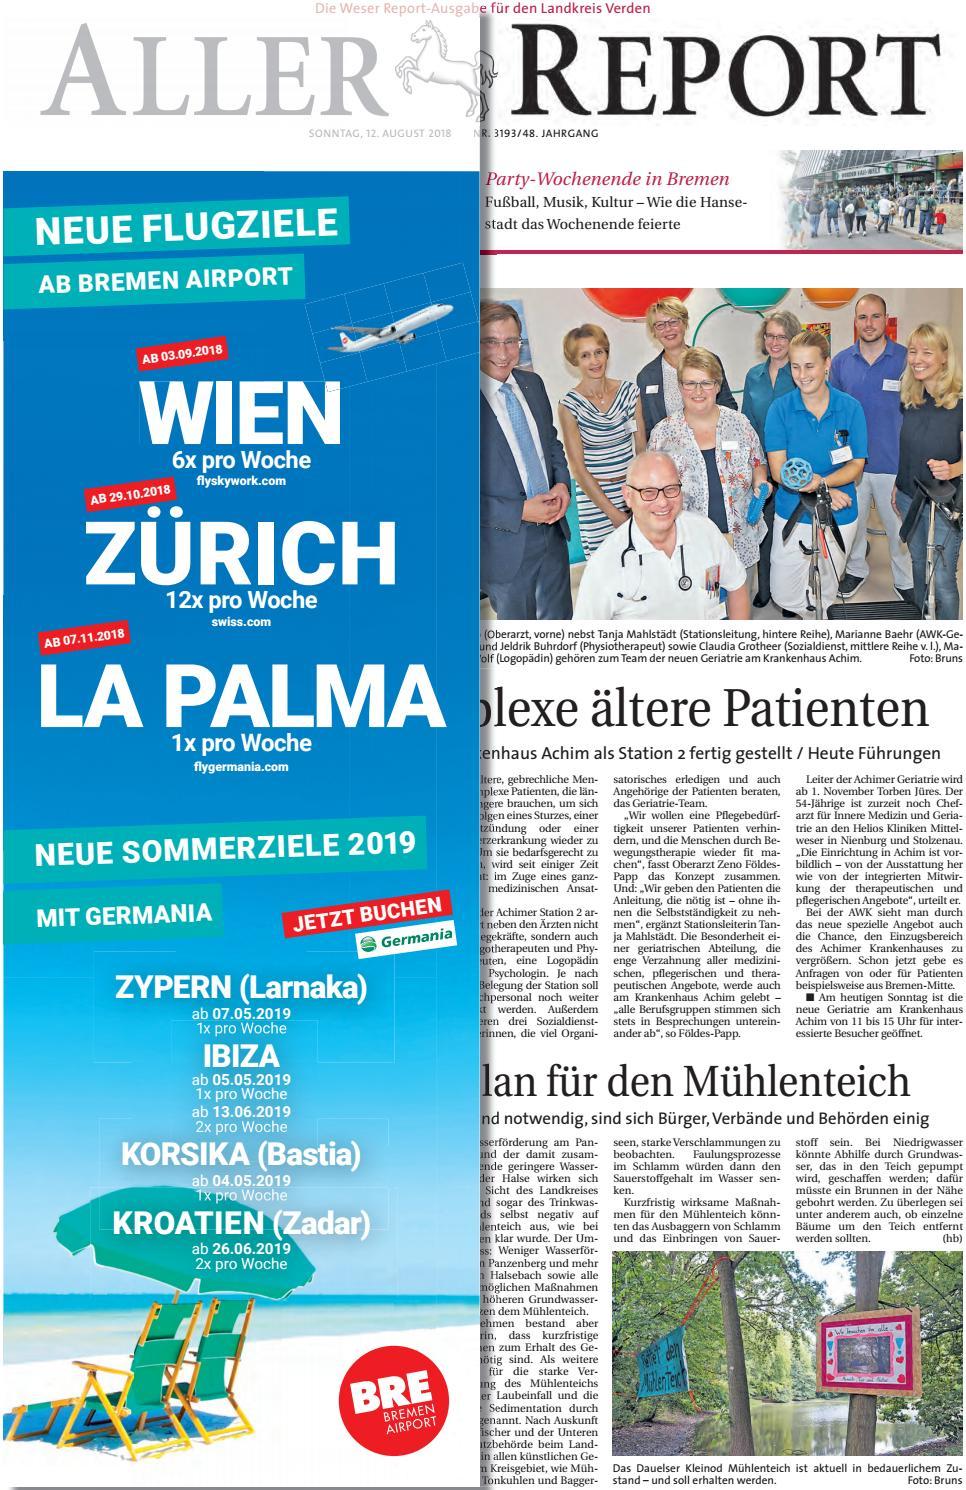 Aller Report vom 12.08.2018 by KPS Verlagsgesellschaft mbH - issuu